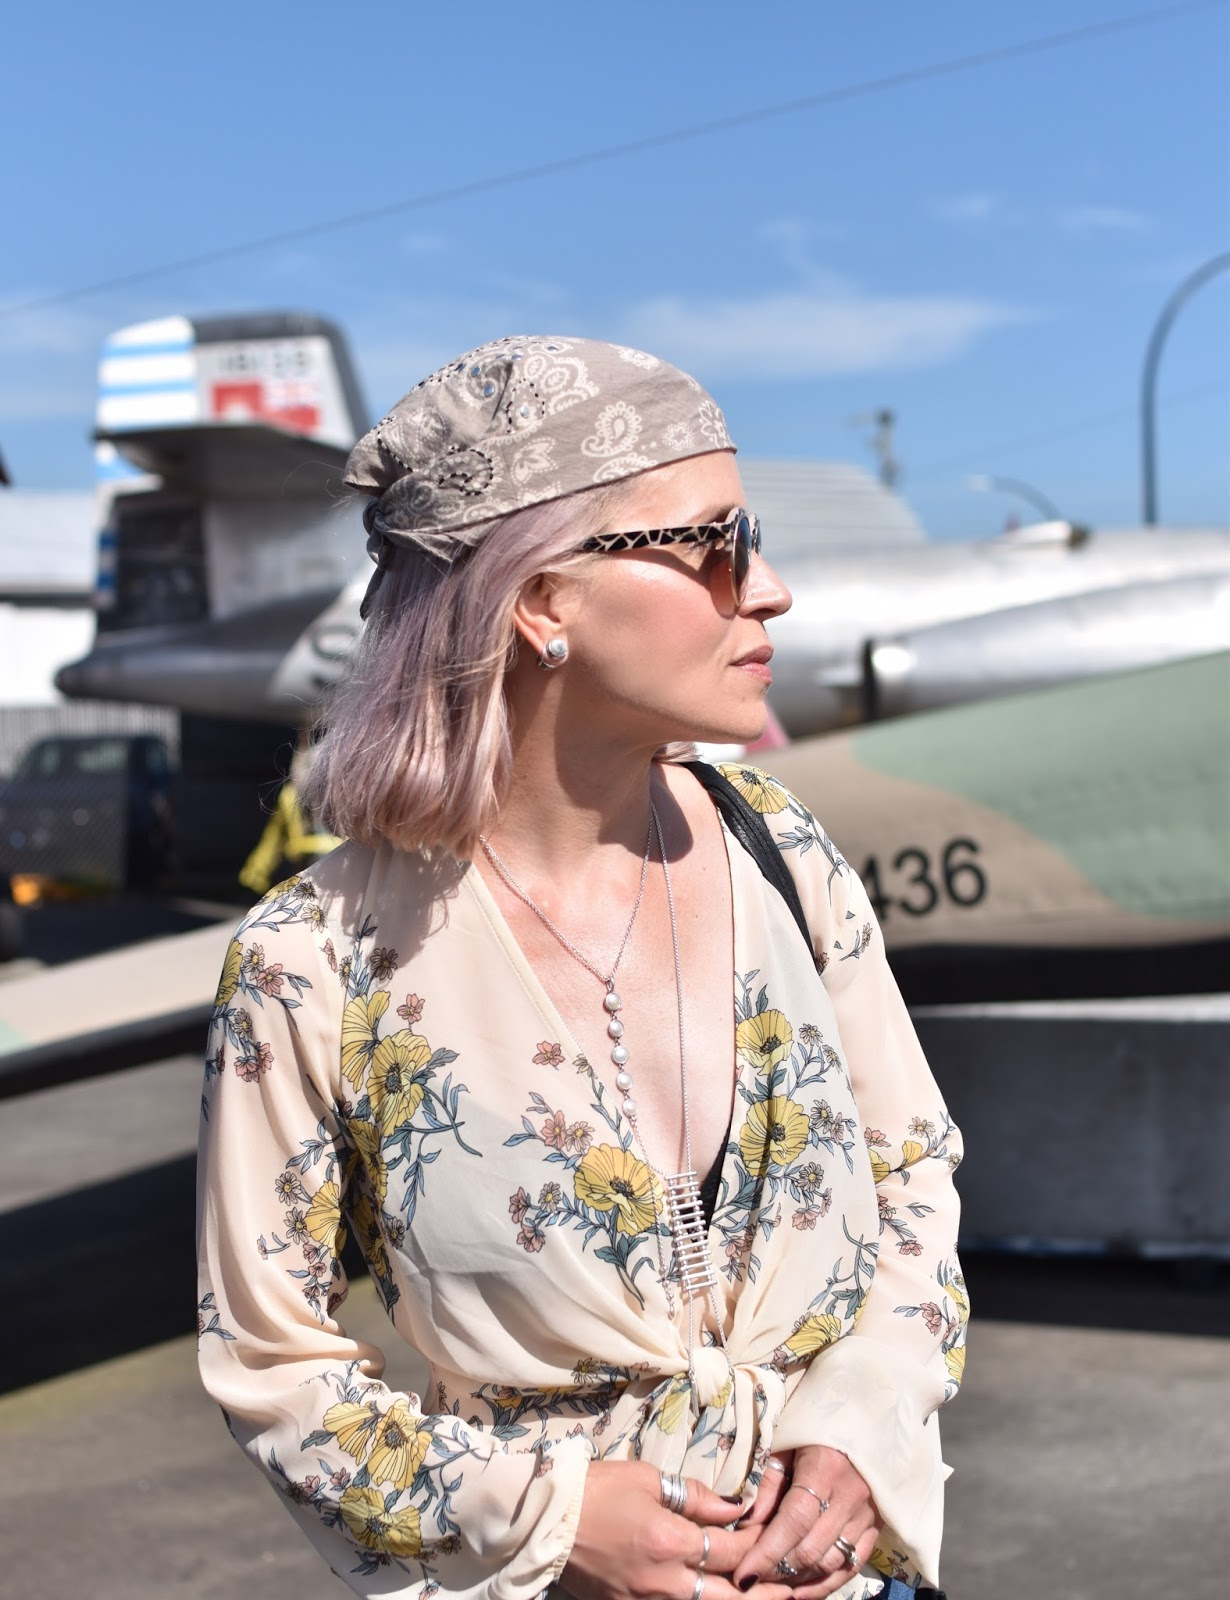 Monika Faulkner outfit inspiration - tie-front floral blouse, bandana head scarf, Nanette sunglasses